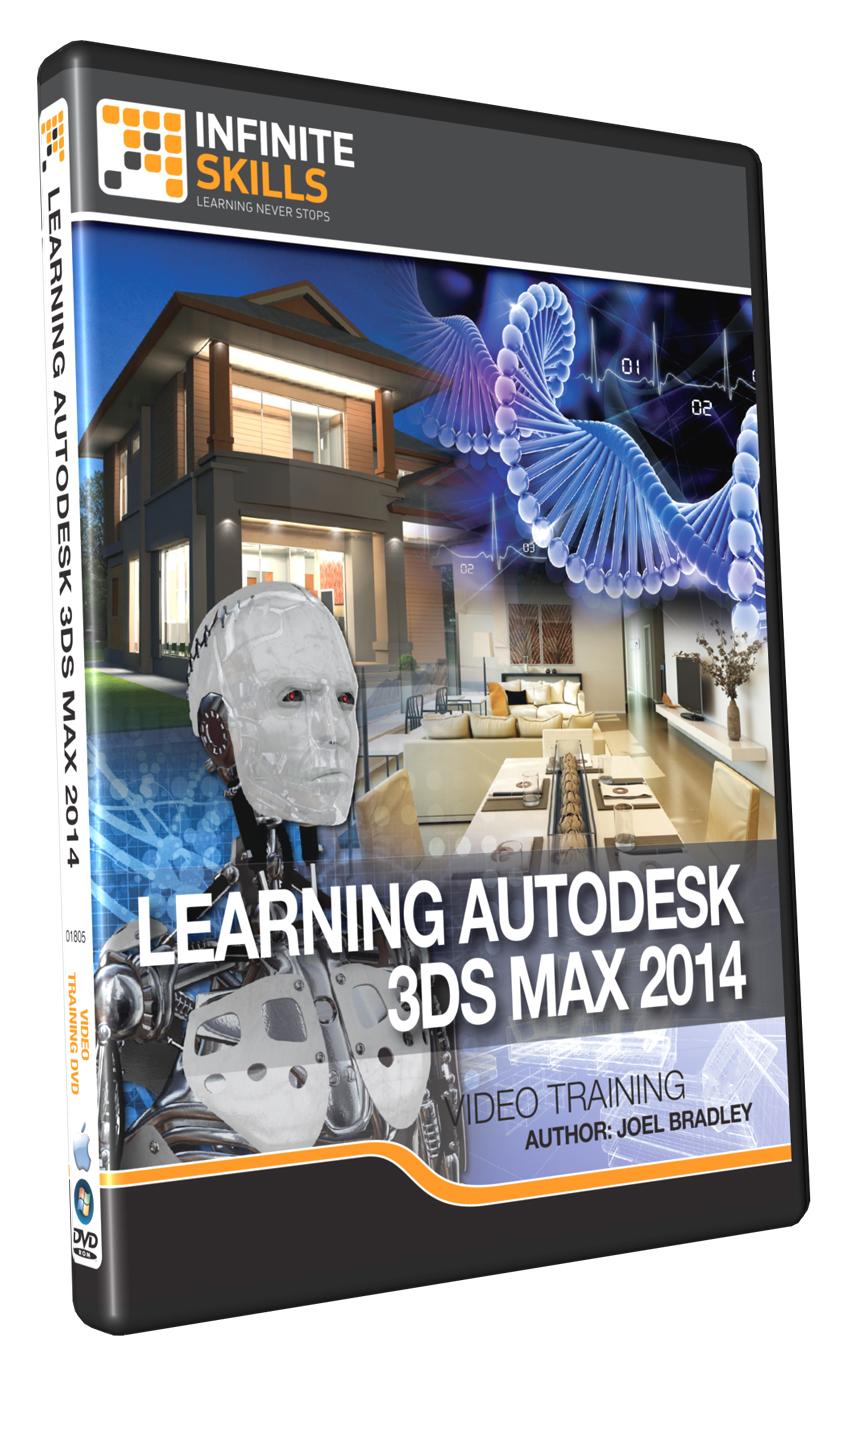 Infinite skills learning autodesk autocad 2014 discount